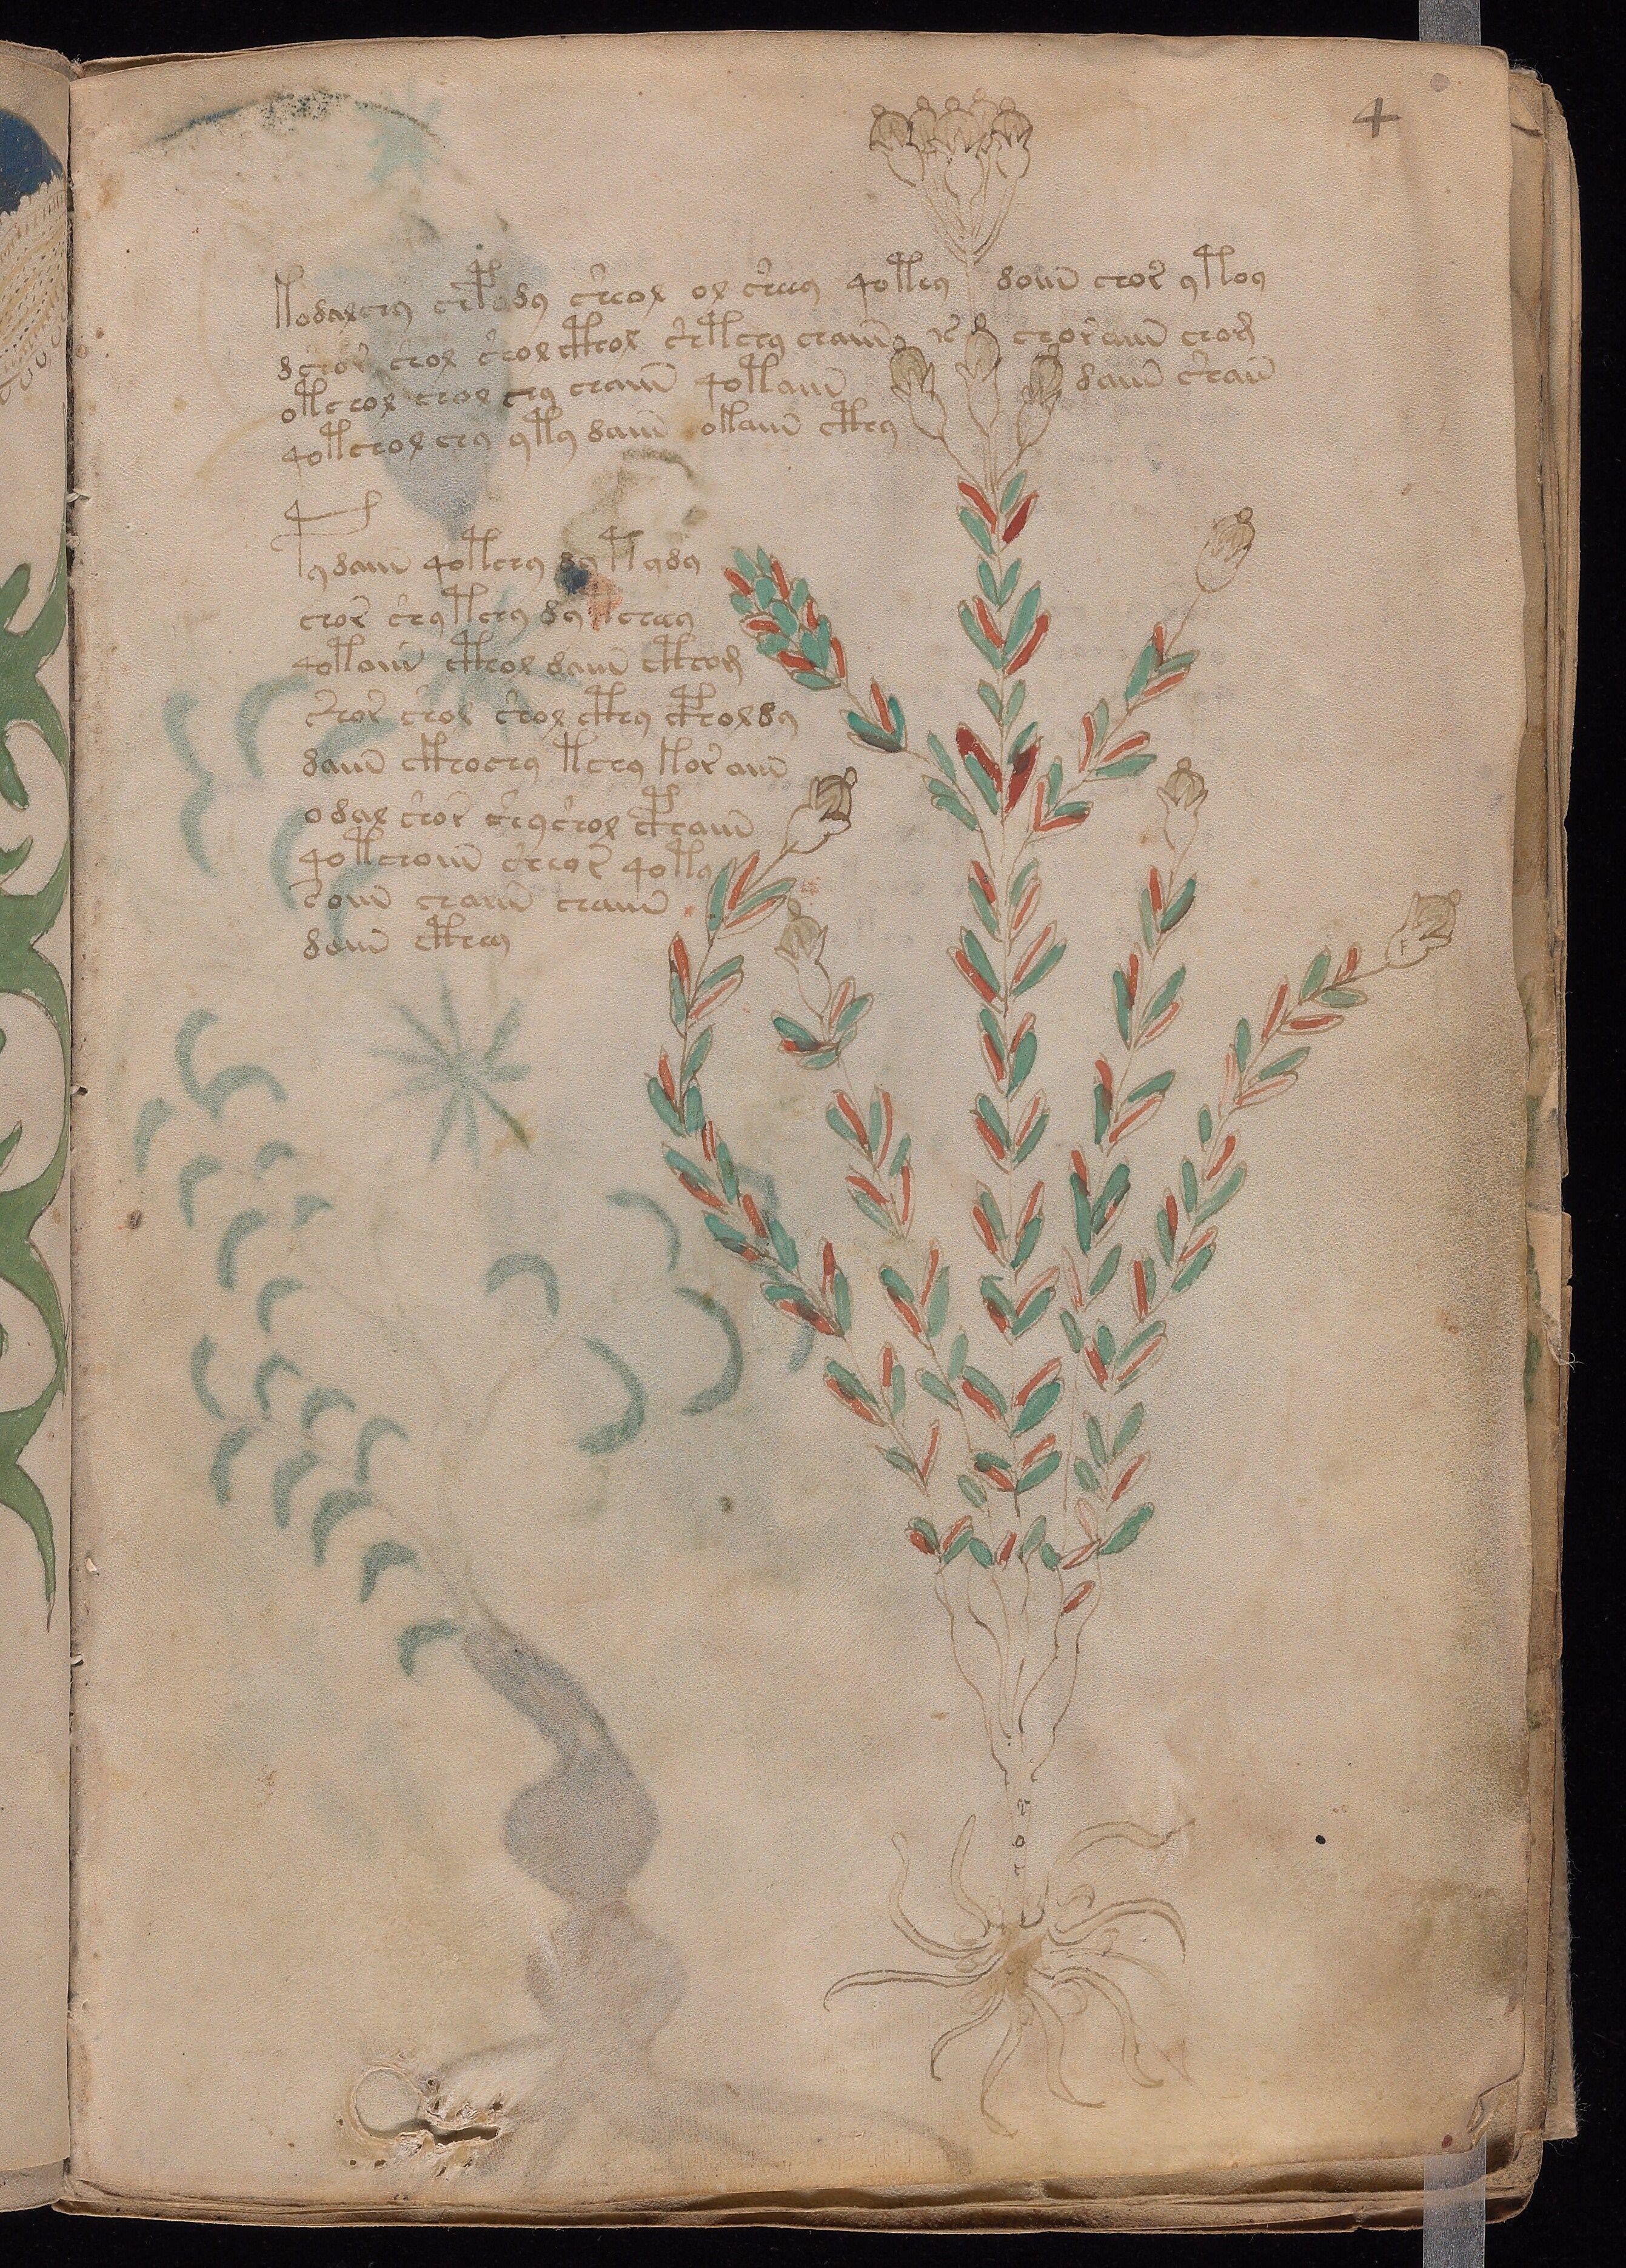 #VoynichManuscript | #CipherManuscript | Page 4 (1) | Original Pin Cormael Lia http://www.pinterest.com/cormaellia/voynich-manuscript/